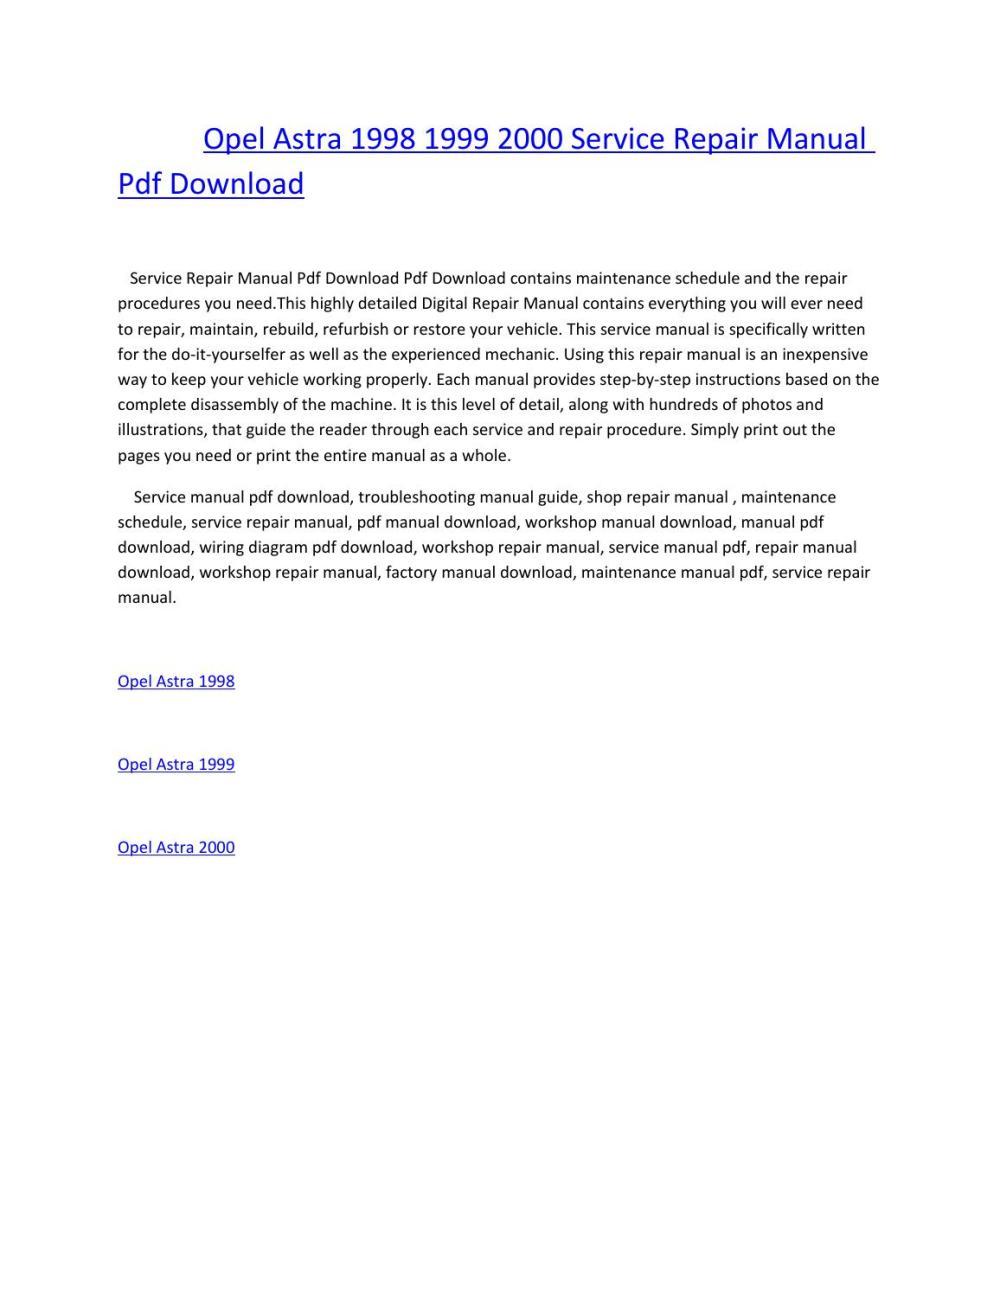 medium resolution of vauxhall opel astra g workshop service repair manual download 1998